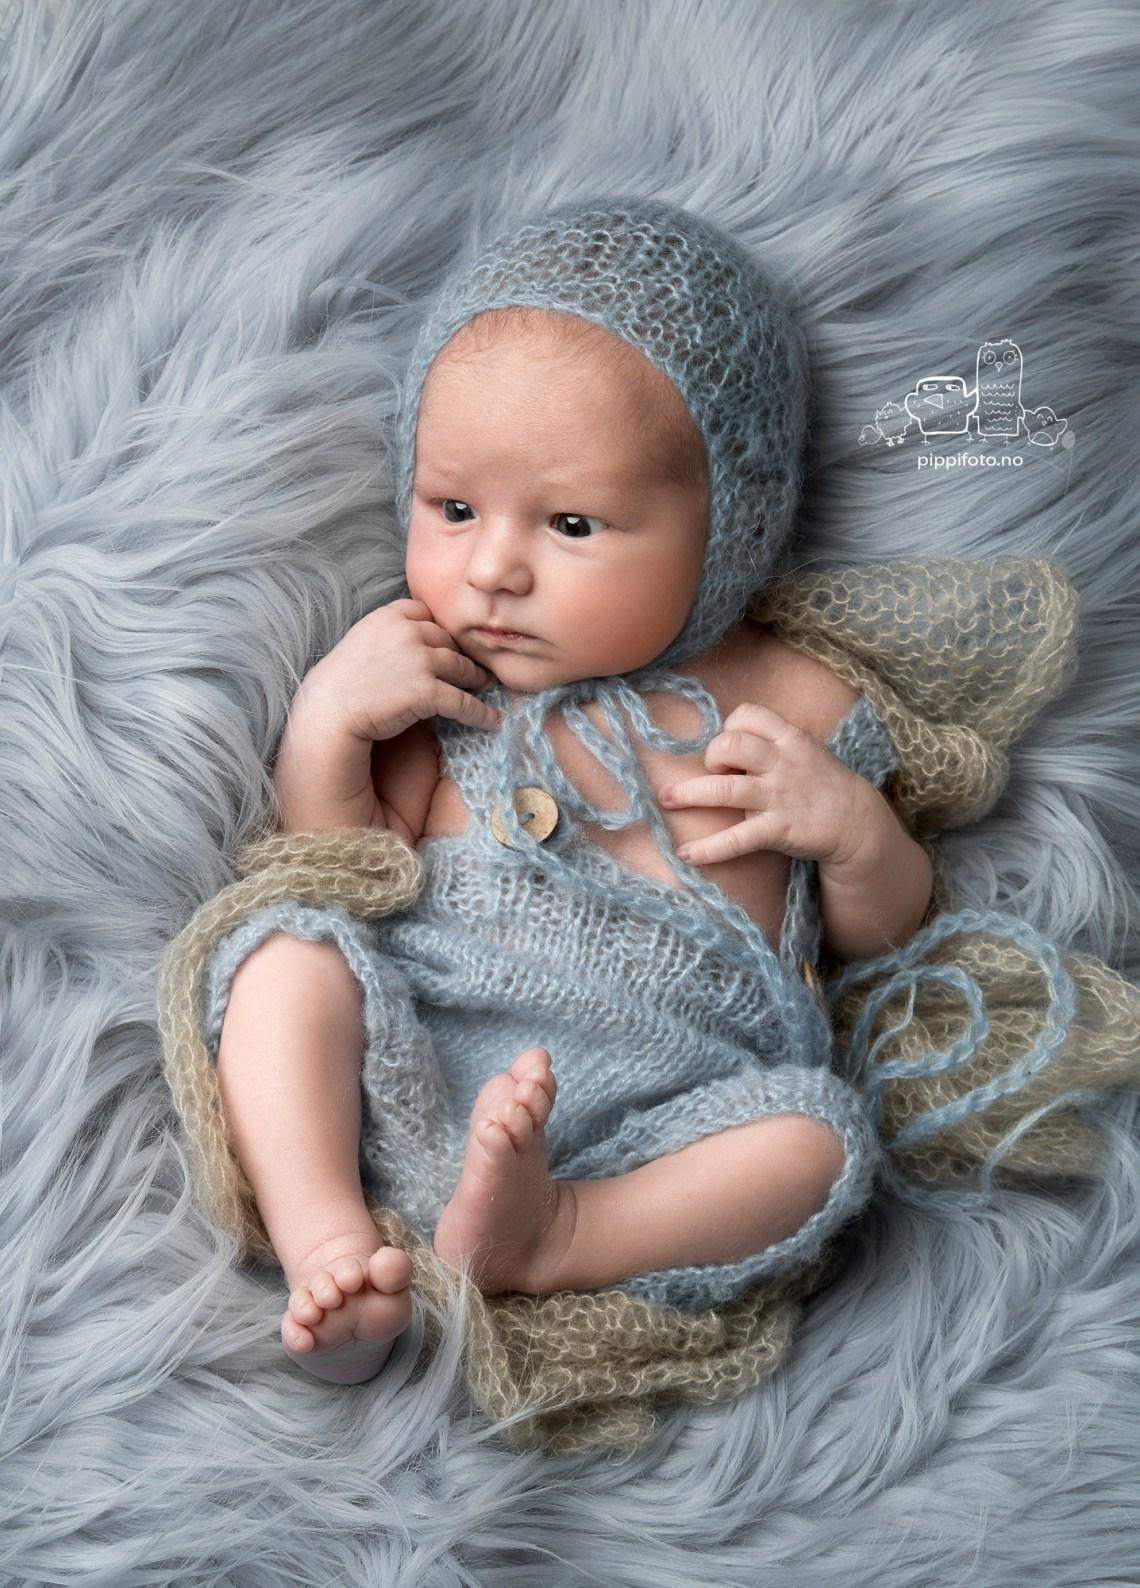 nyfødtfoto, nyfødtfotografering, babybilder, nyfødt gutt